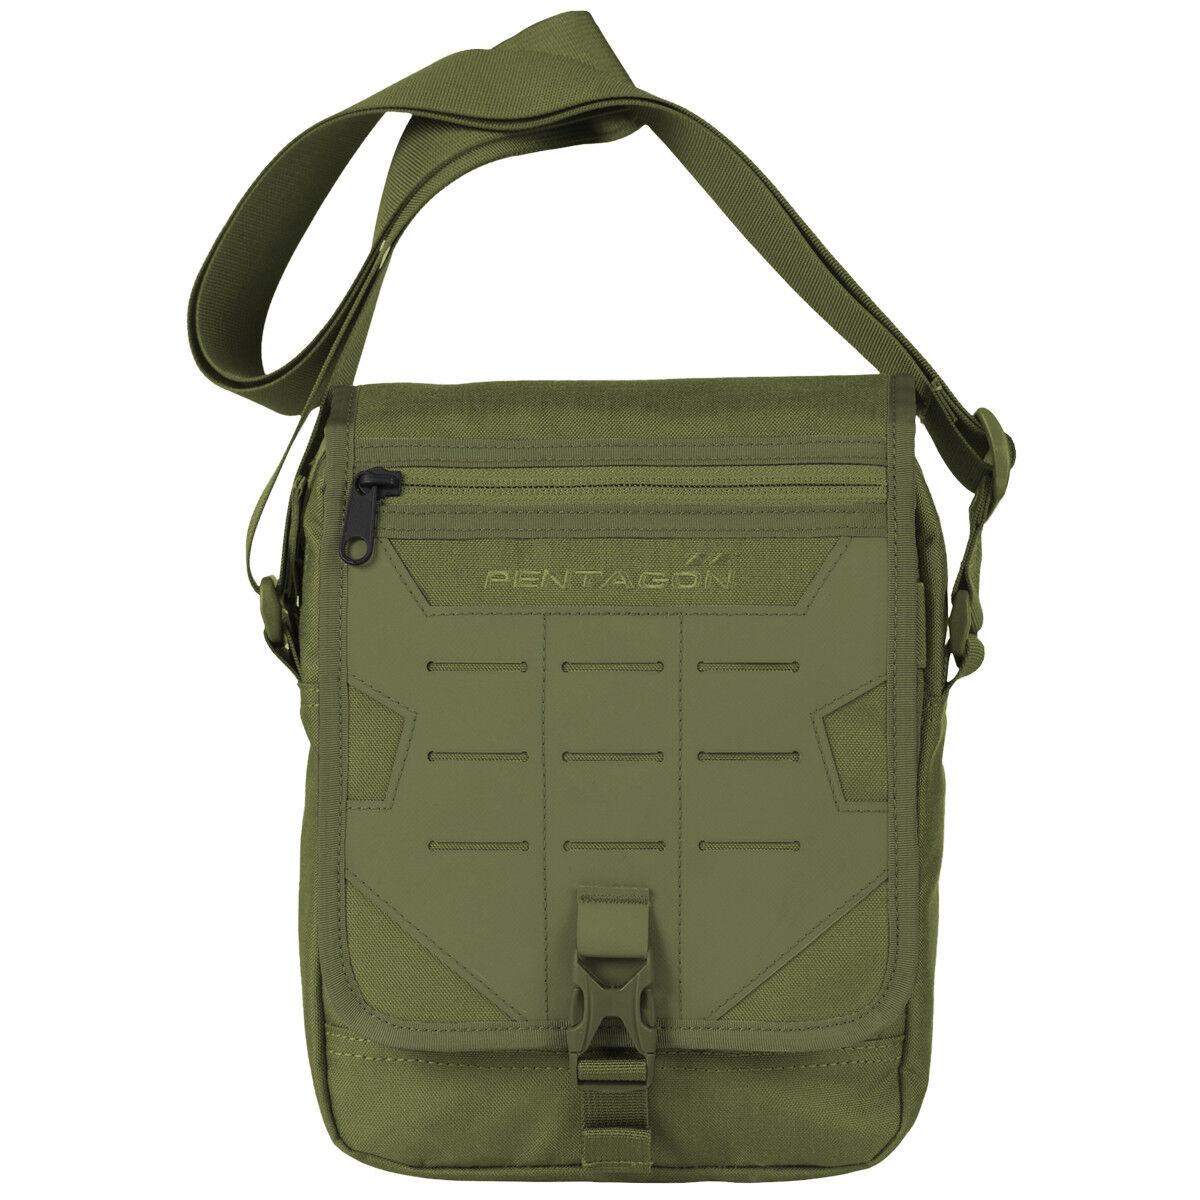 Pentagon Messenger Utility Bag Military Army Hunting MOLLE Shoulder Carry Olive